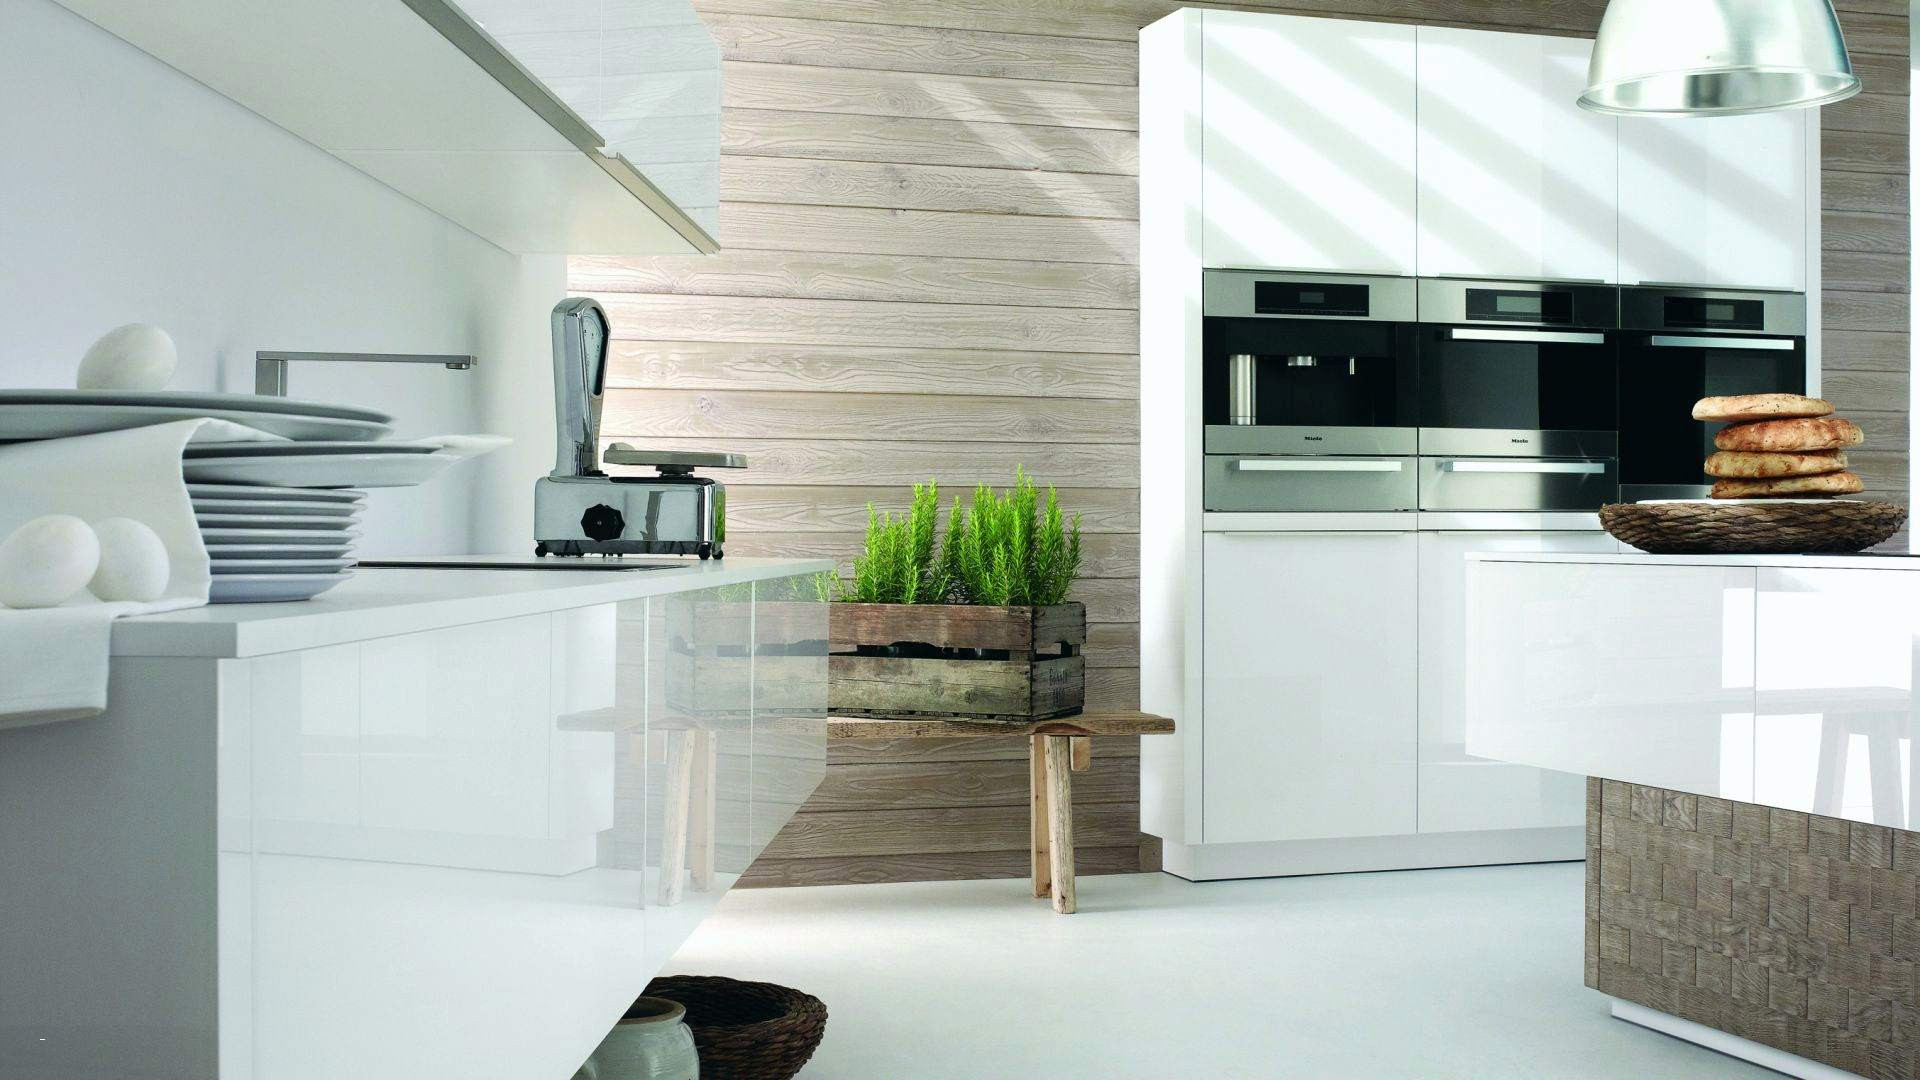 Jouet Cuisine Ikea Luxe Stock Ikea Logiciel Cuisine Inspirant Jouet Cuisine Ikea Magnifique